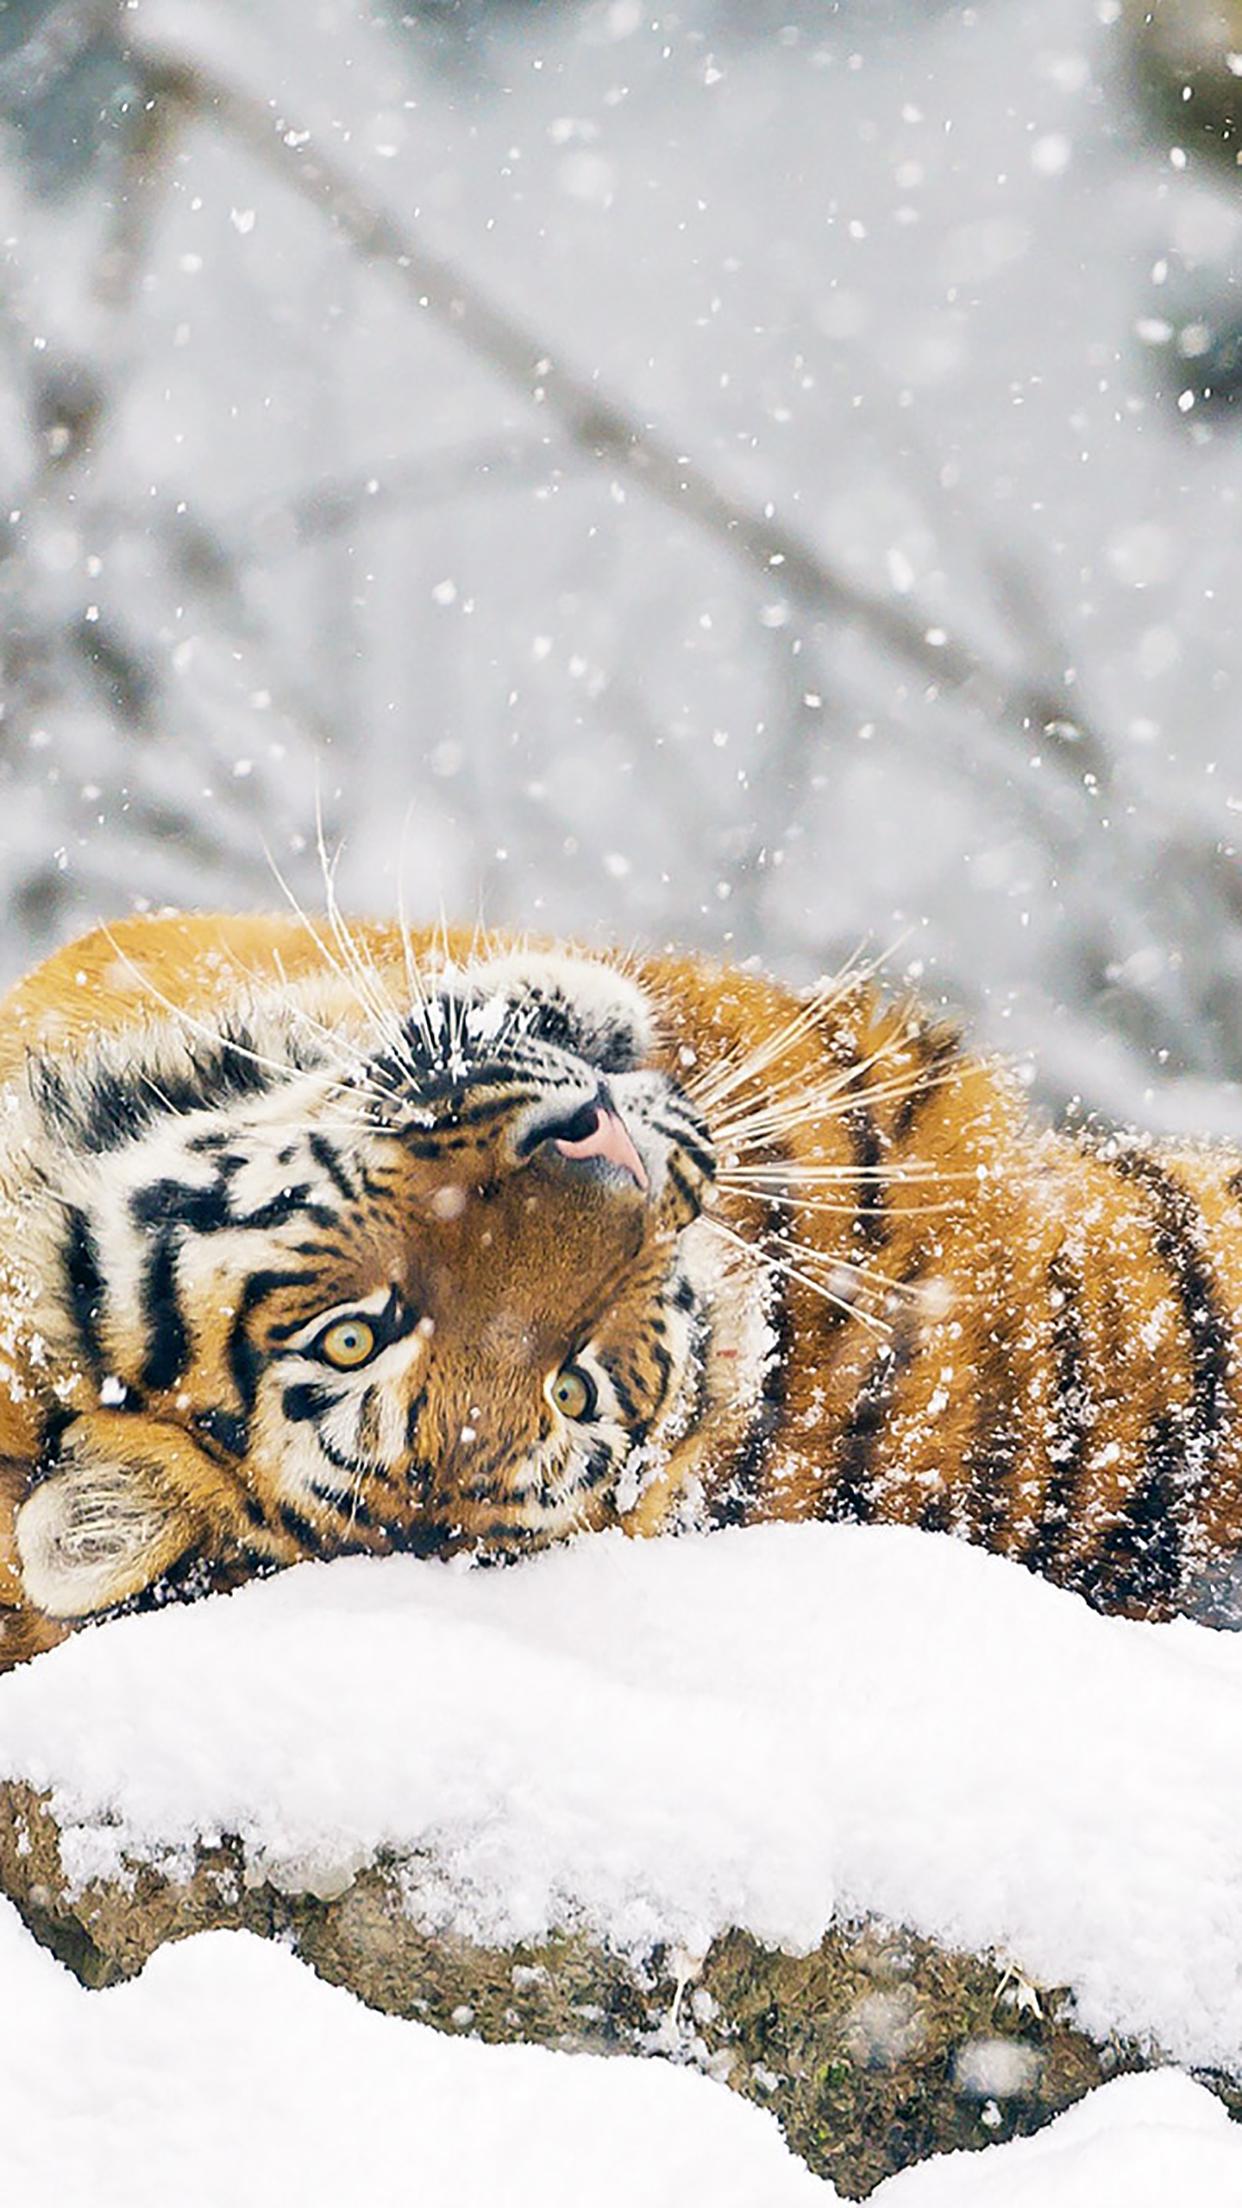 Snow animals ciberian tiger 3Wallpapers iPhone Parallax Snow animals ciberian tiger